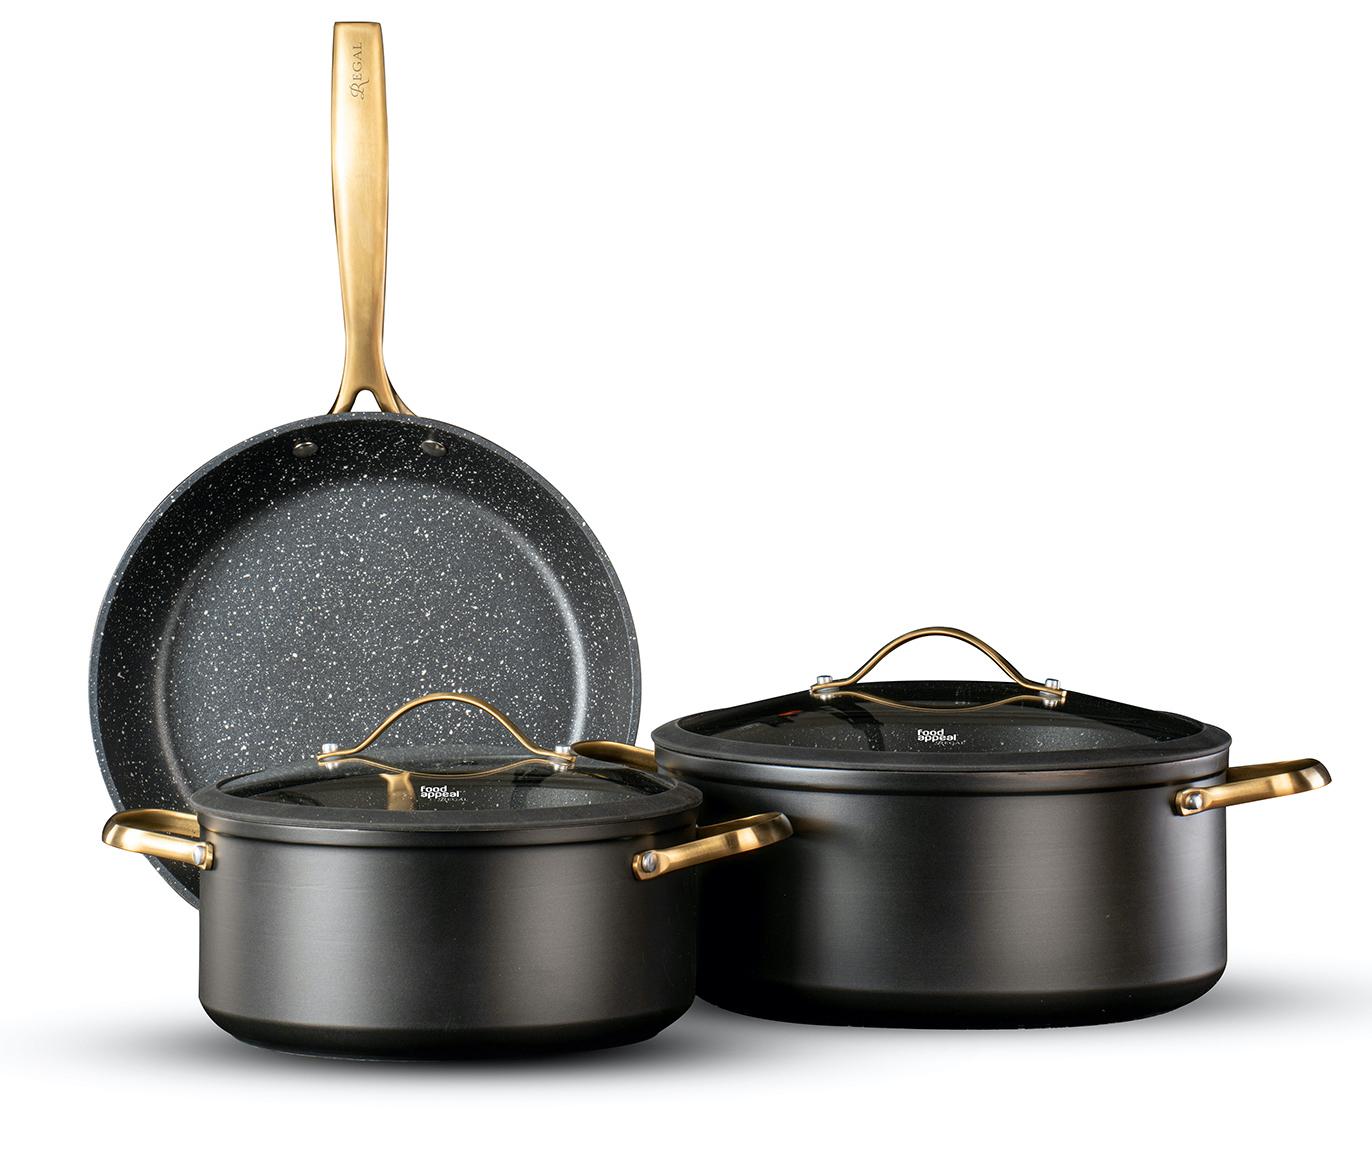 סט 5 כלי בישול Food Appeal Regal פוד אפיל